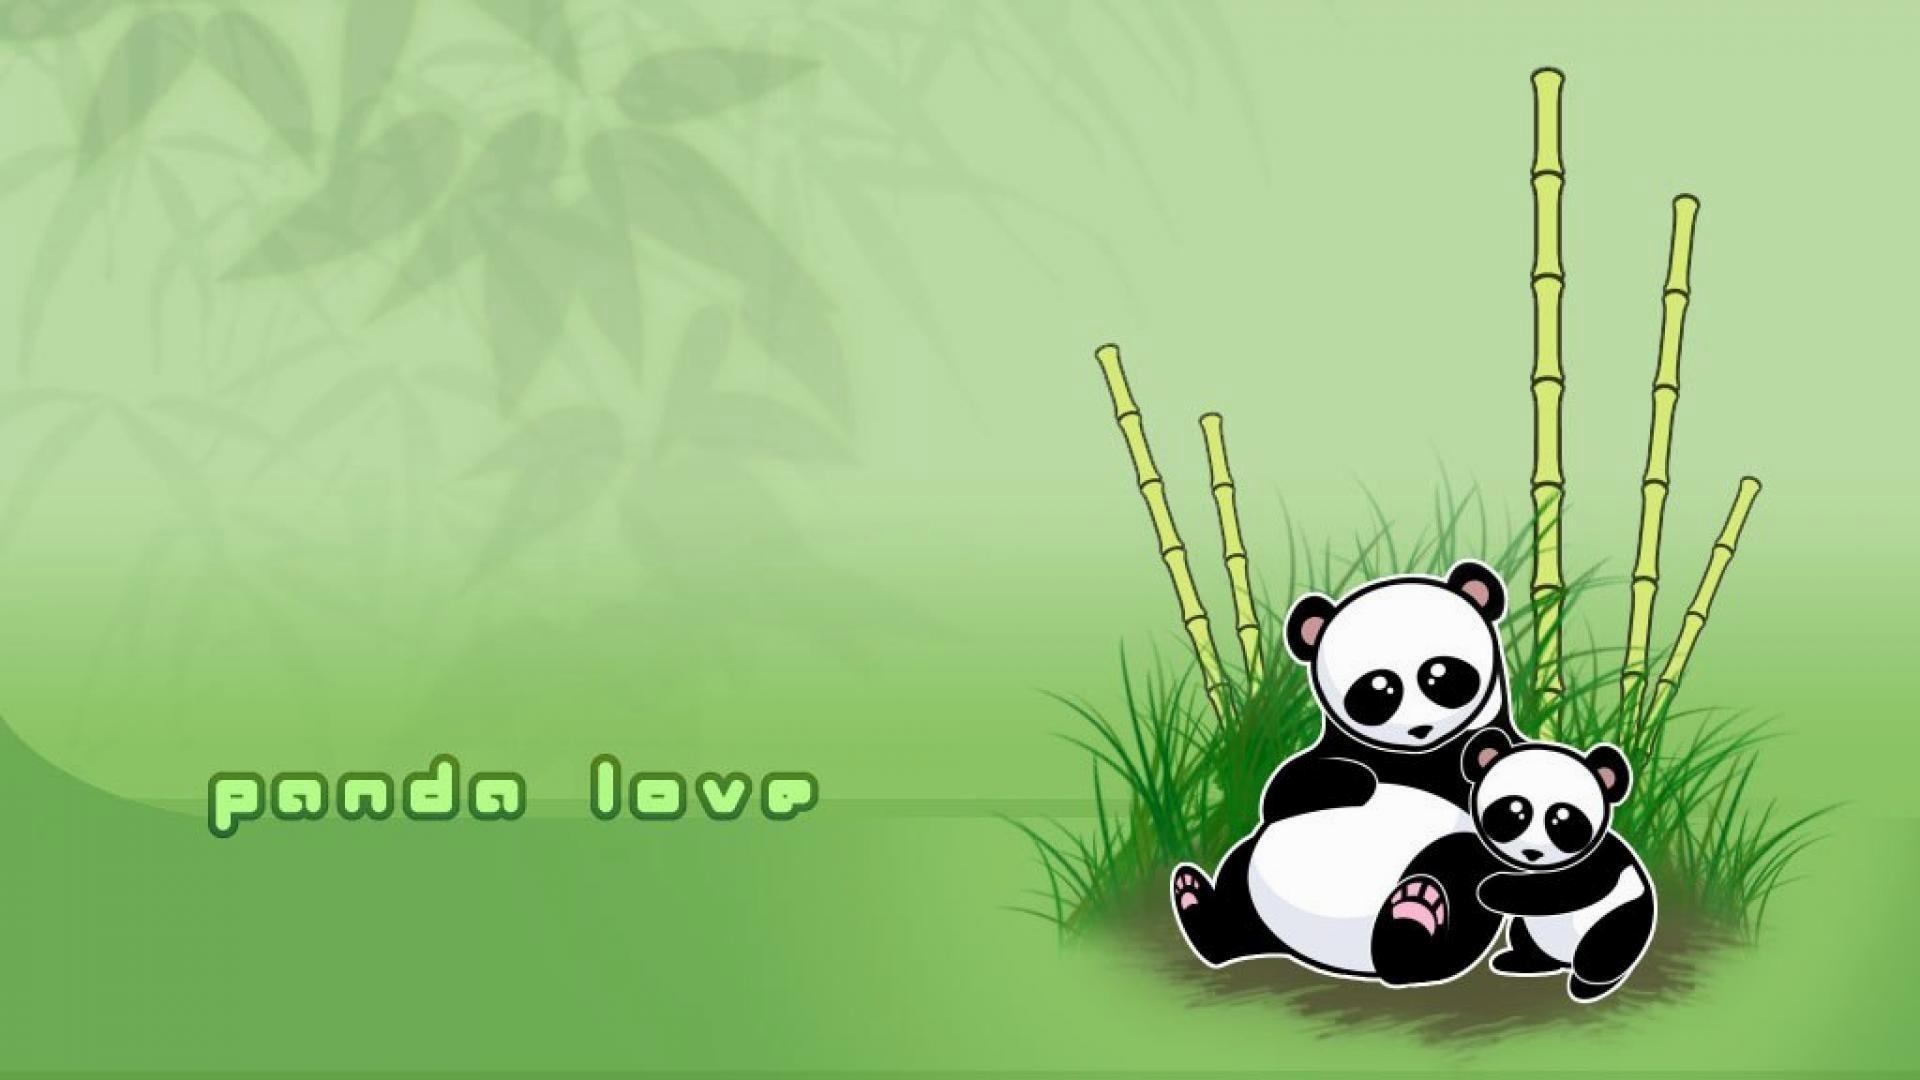 wallpaper.wiki-HD-Cute-Panda-Image-Tumblr-PIC-WPE0010697